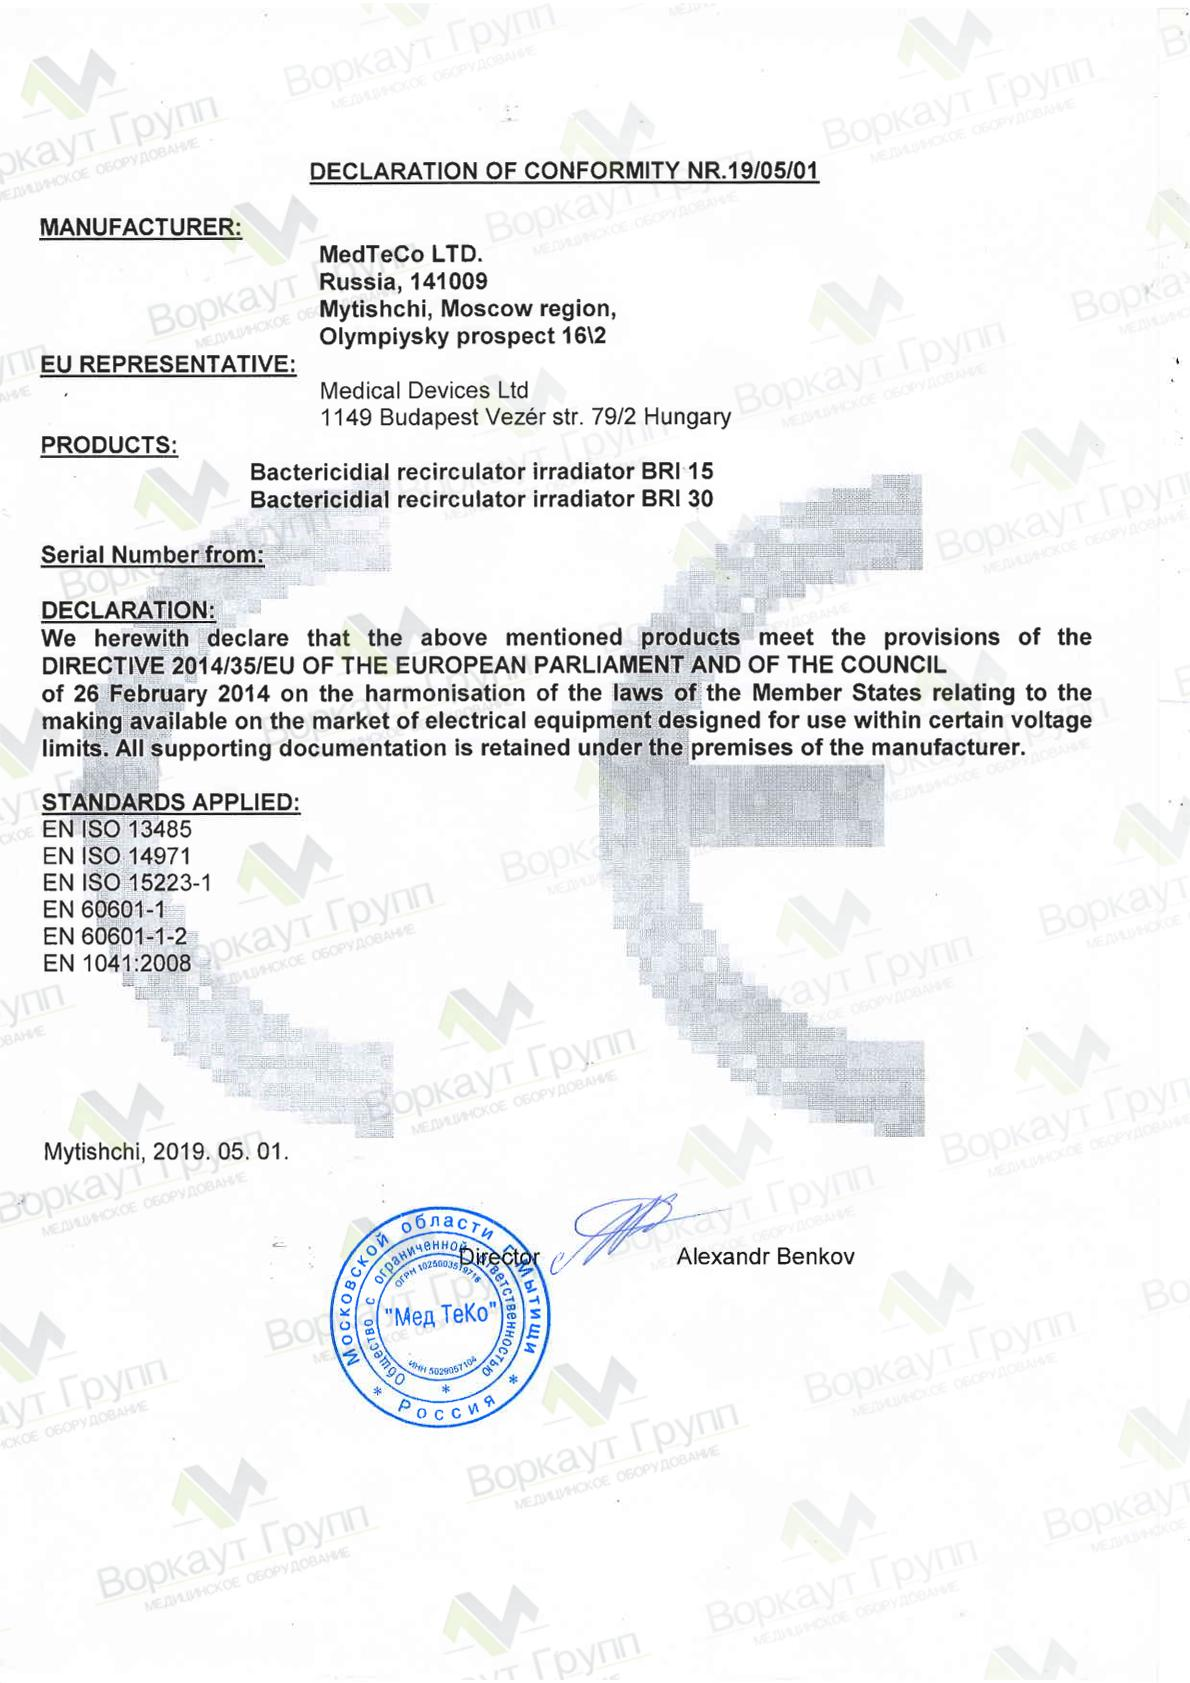 СЕ Декларация ОБР-15